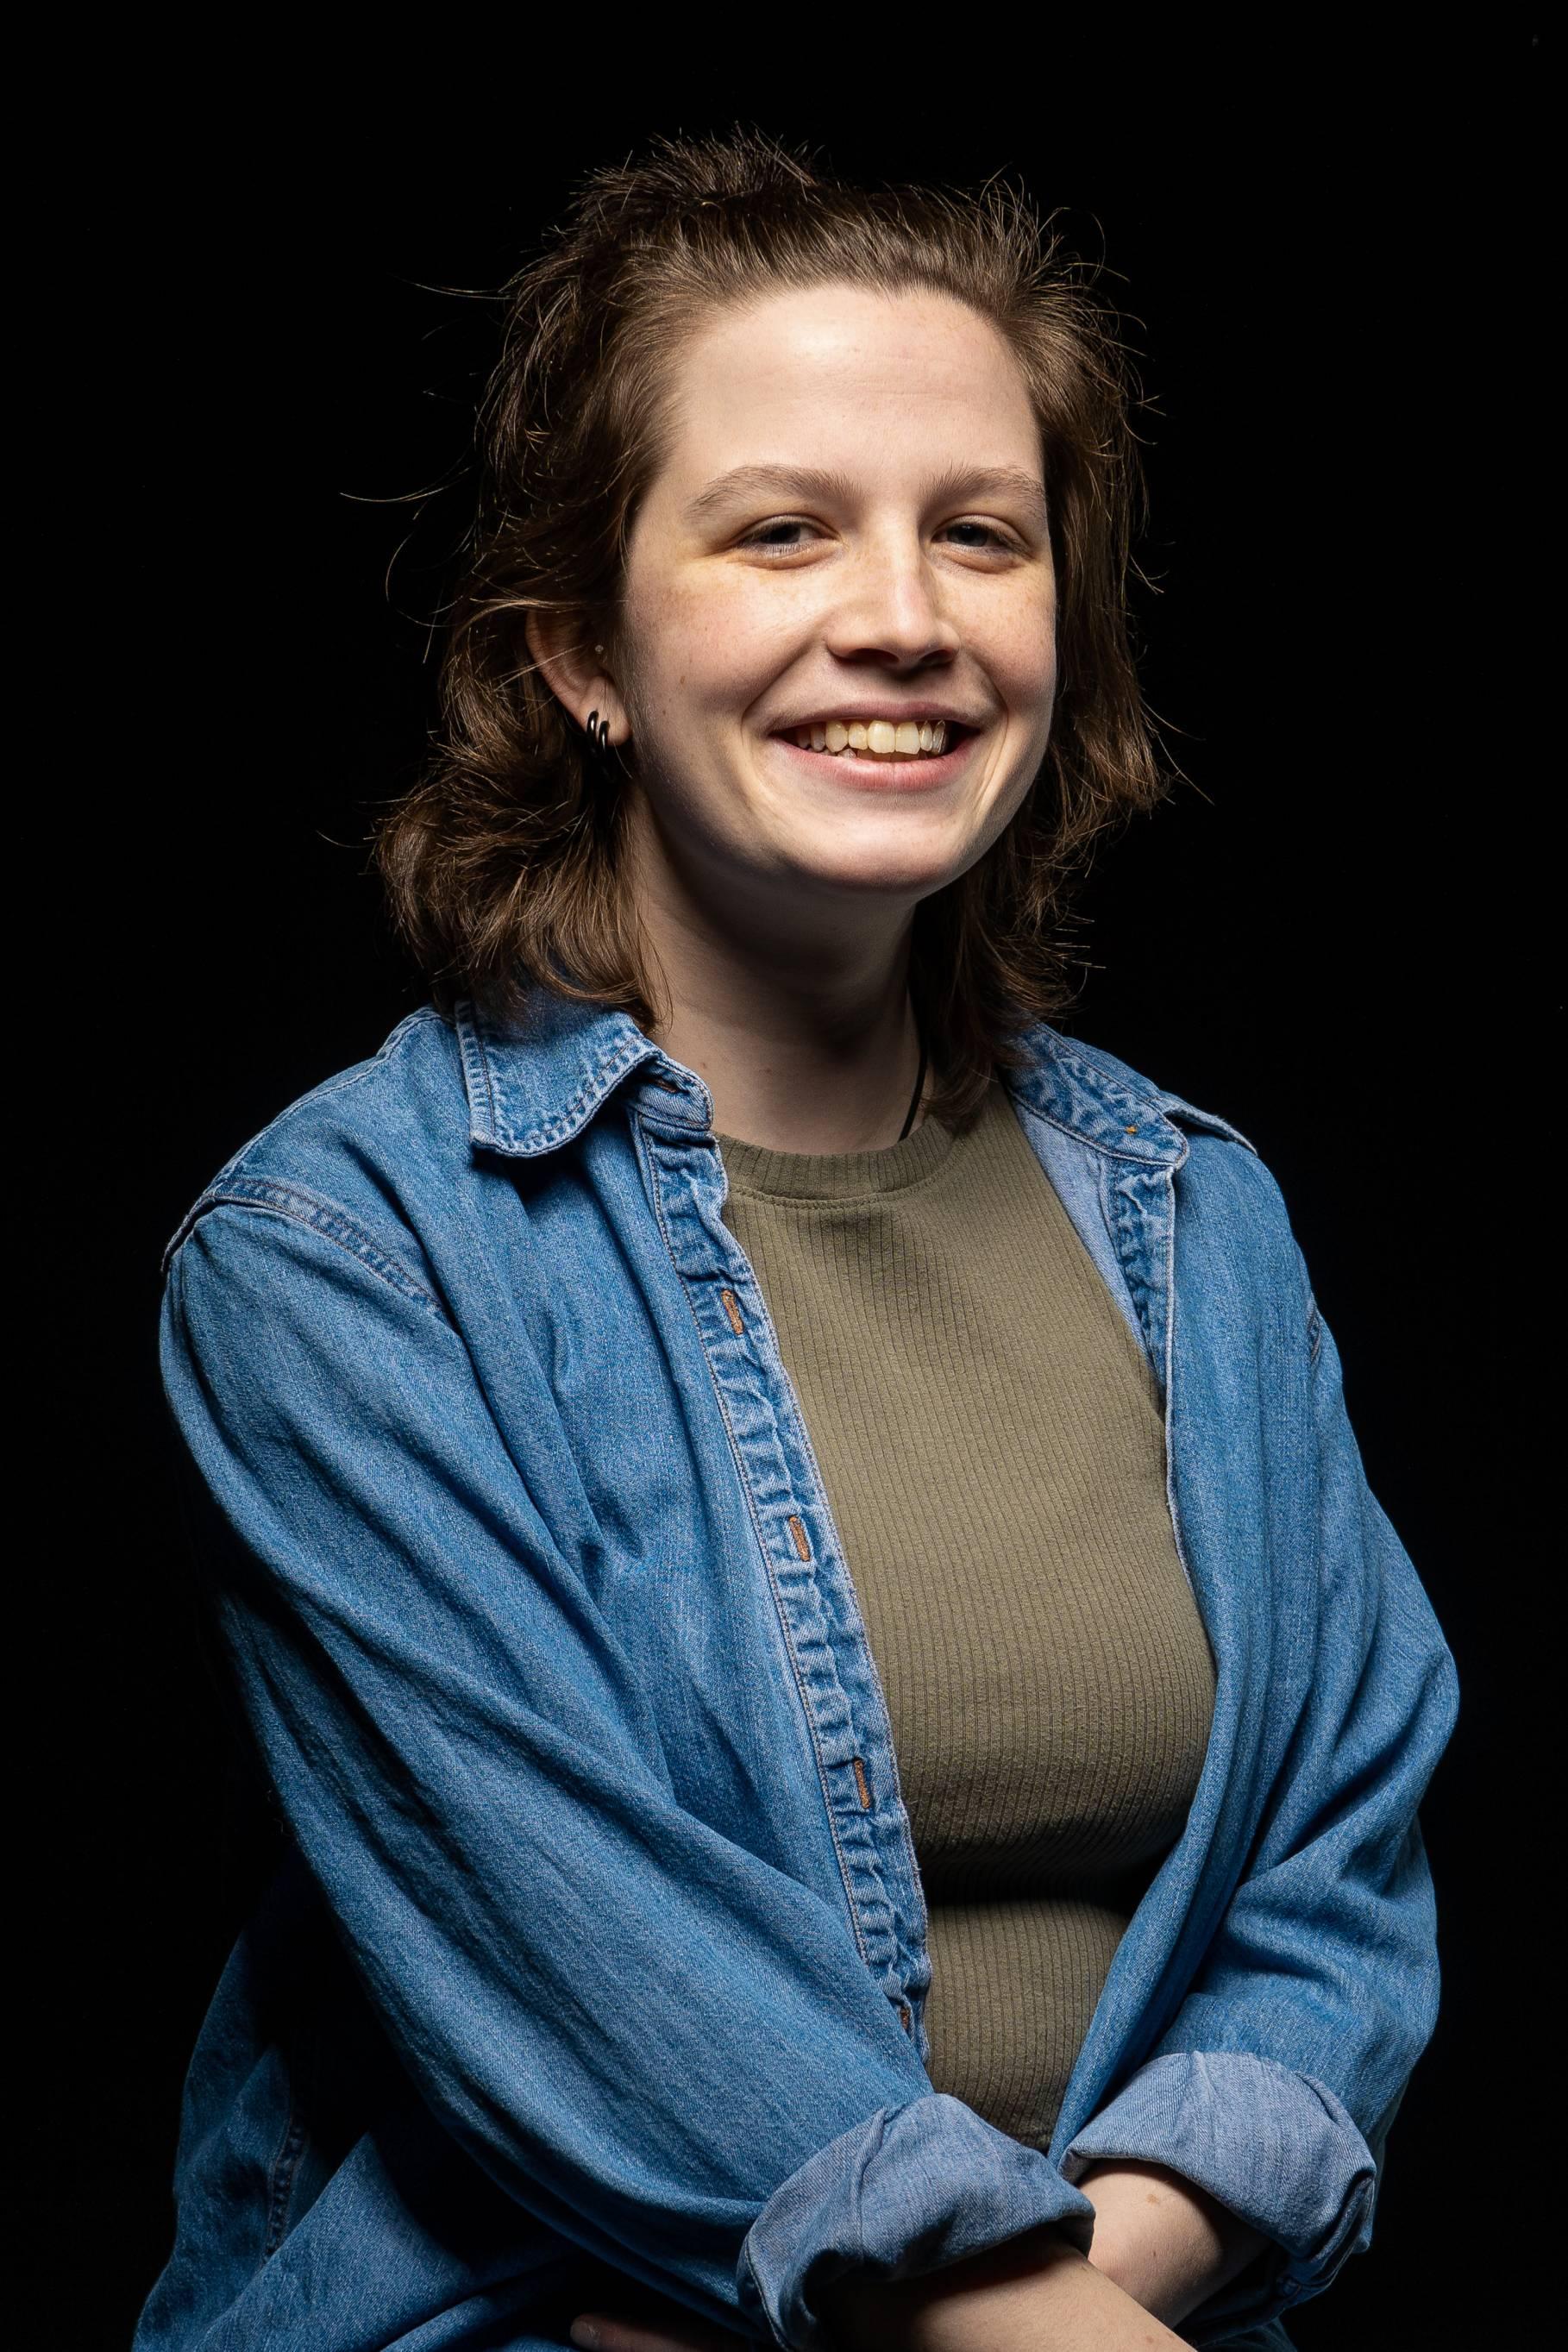 Samantha North, Fim & Television Production Advanced Diploma Program Graduate and aspiring Director